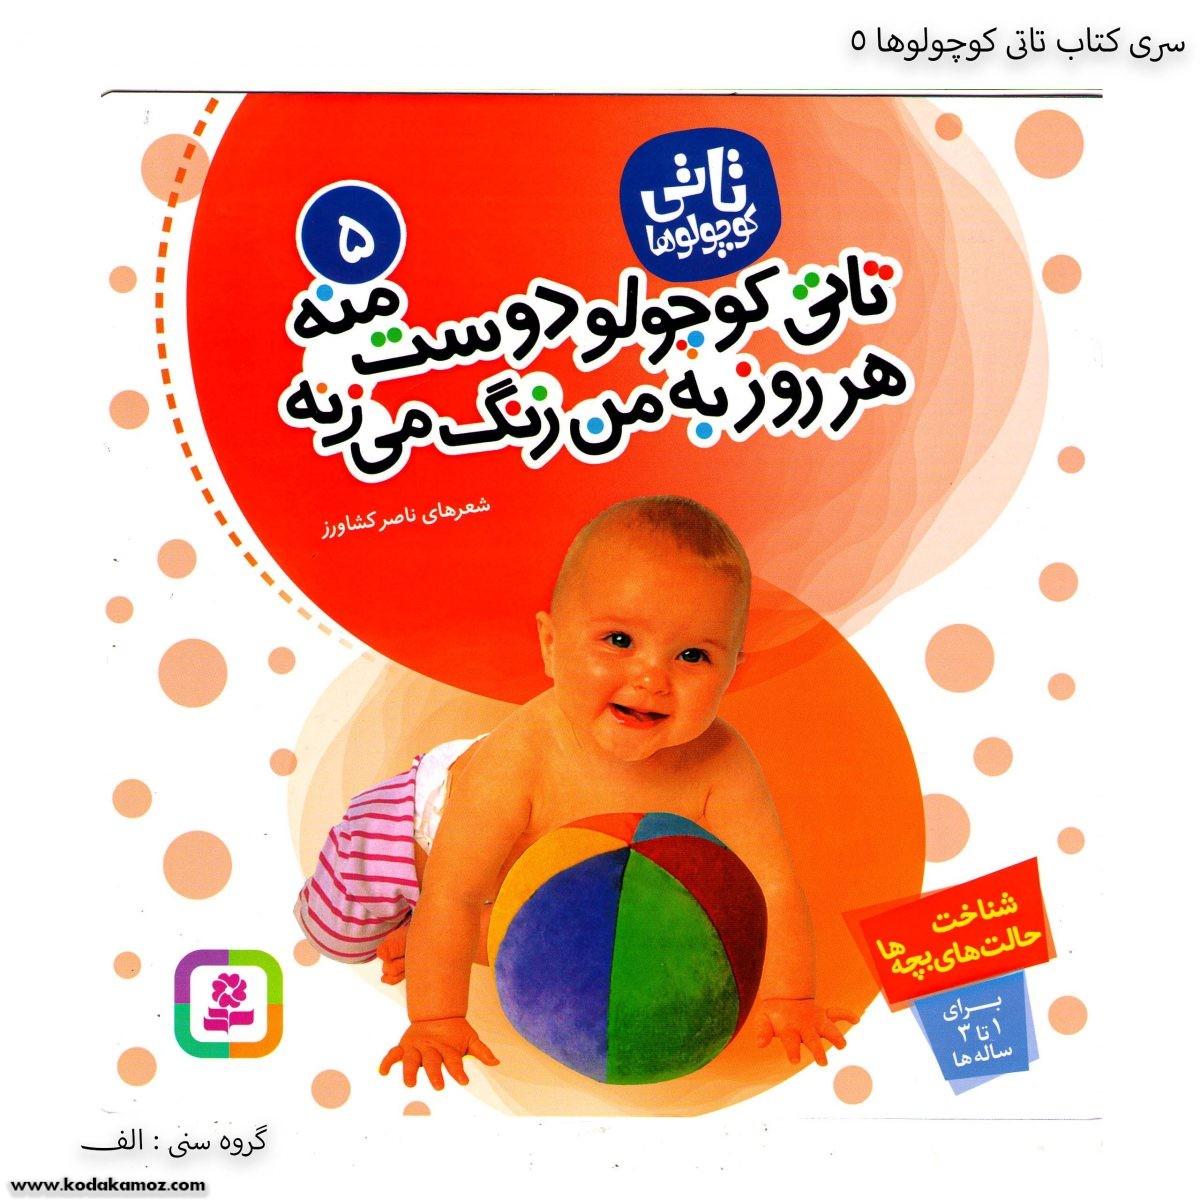 کتاب تاتی کوچولوها - تاتی کوچولو دوست منه کد 5